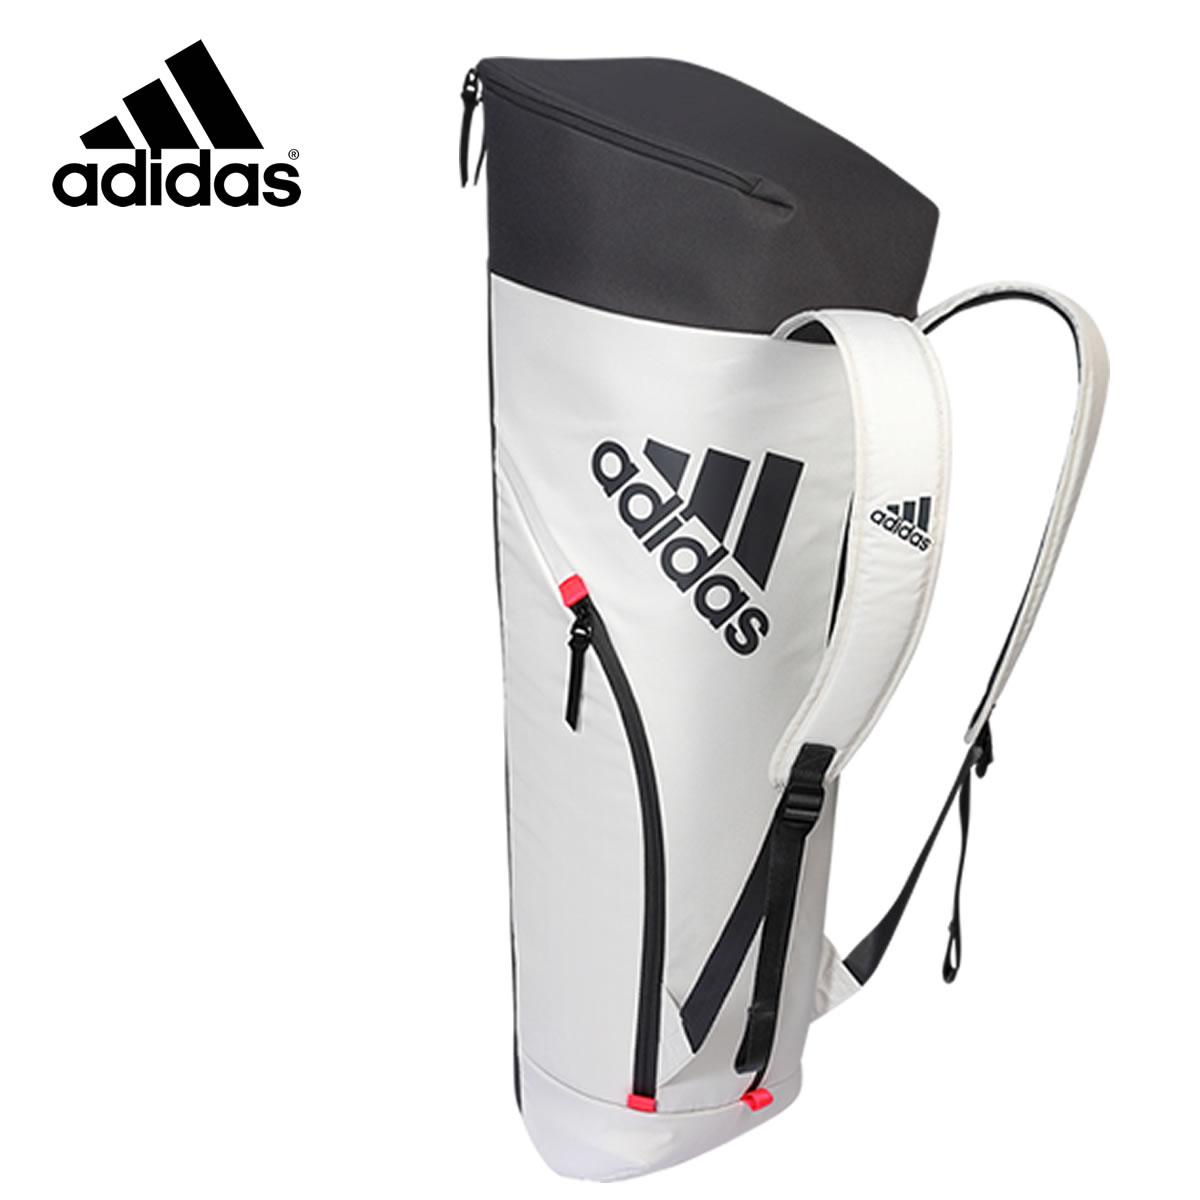 adidas BG940211 スタイルラケットバッグ(6本入) ホワイト バドミントンバッグ アディダス【取り寄せ】